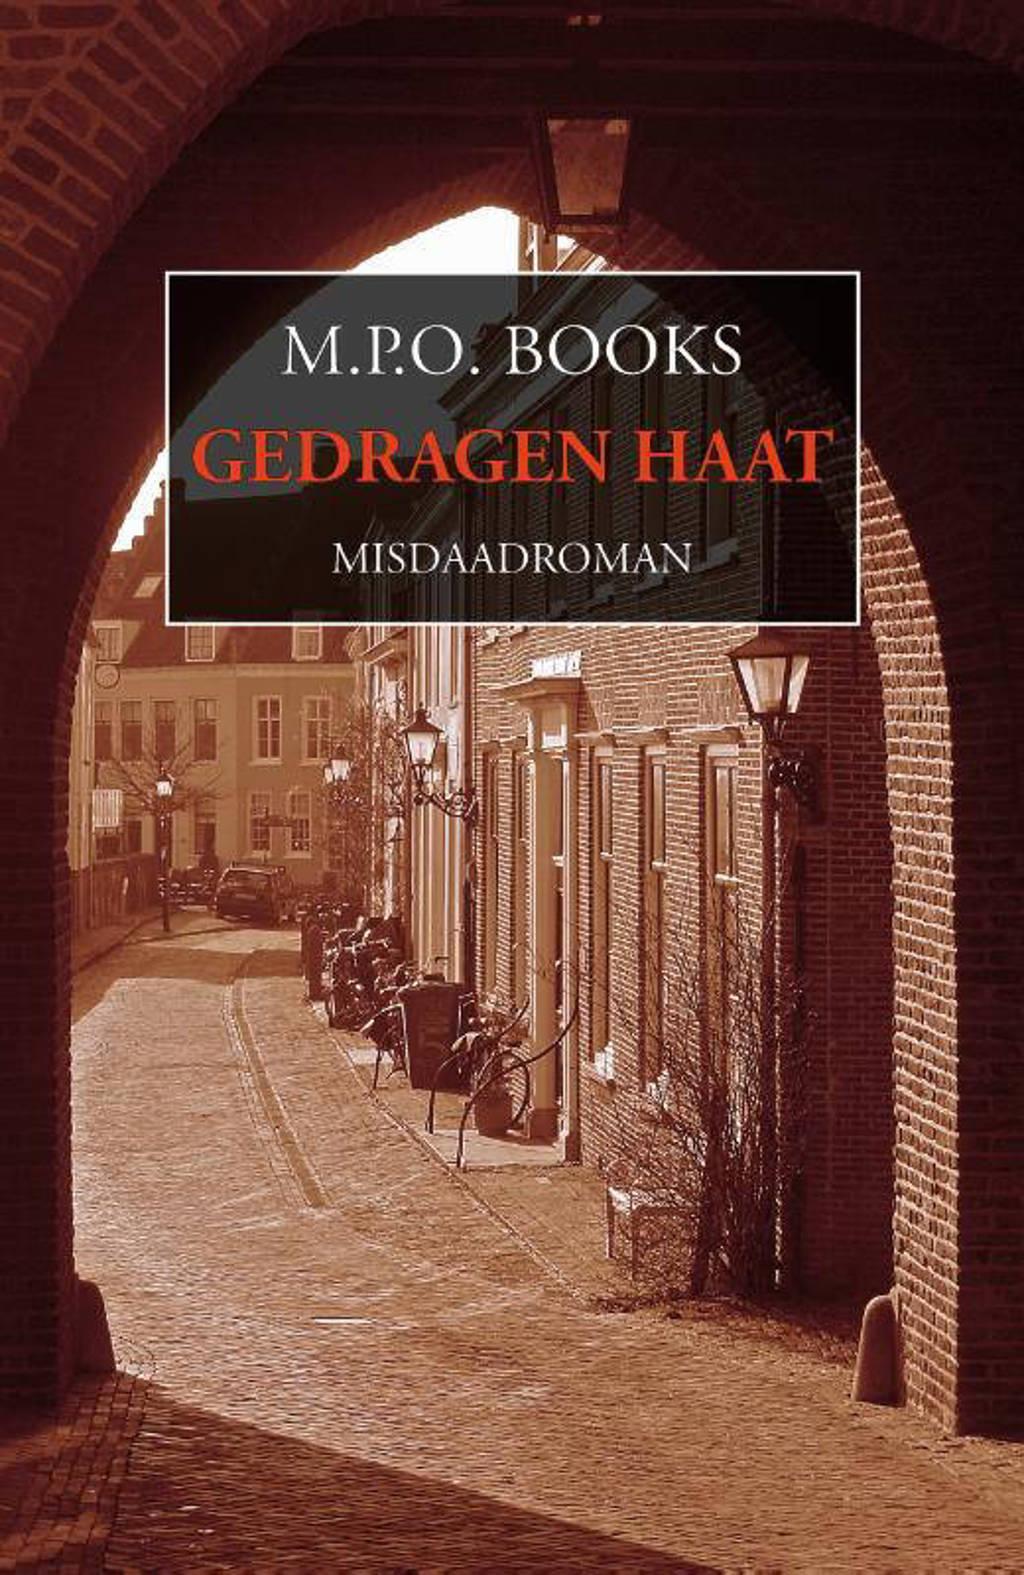 District Heuvelrug: Gedragen haat - M.P.O. Books